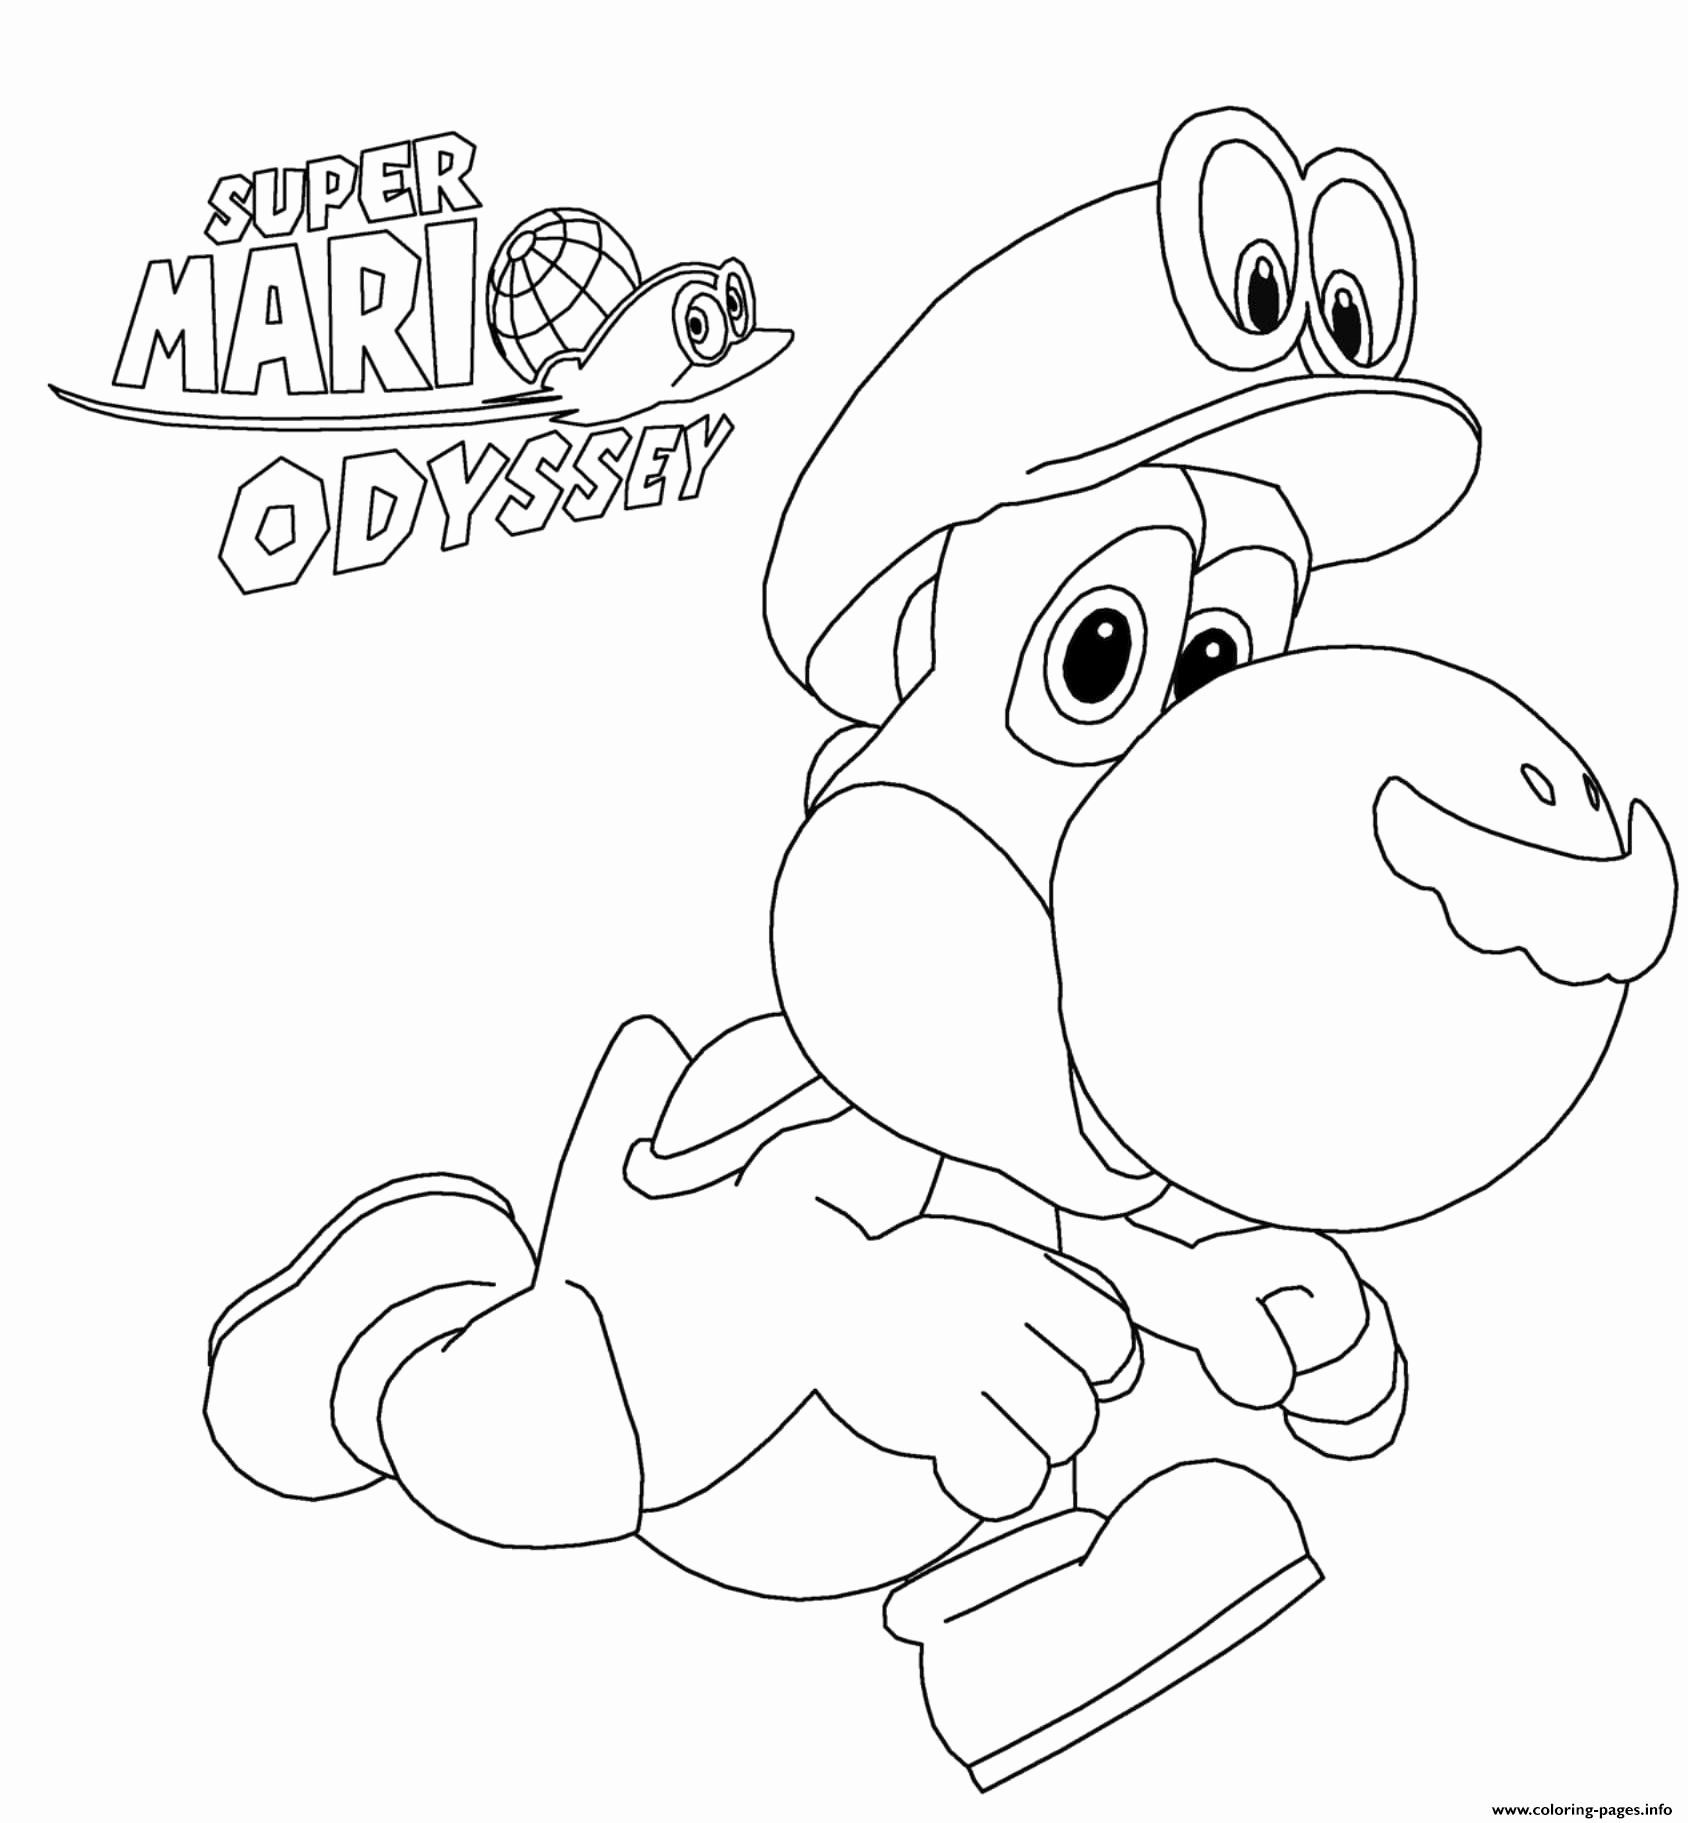 Cartoon Coloring To Print Elegant 46 Nintendo Kirby Coloring Pages To Print Mario Coloring Pages Bird Coloring Pages Coloring Pages To Print